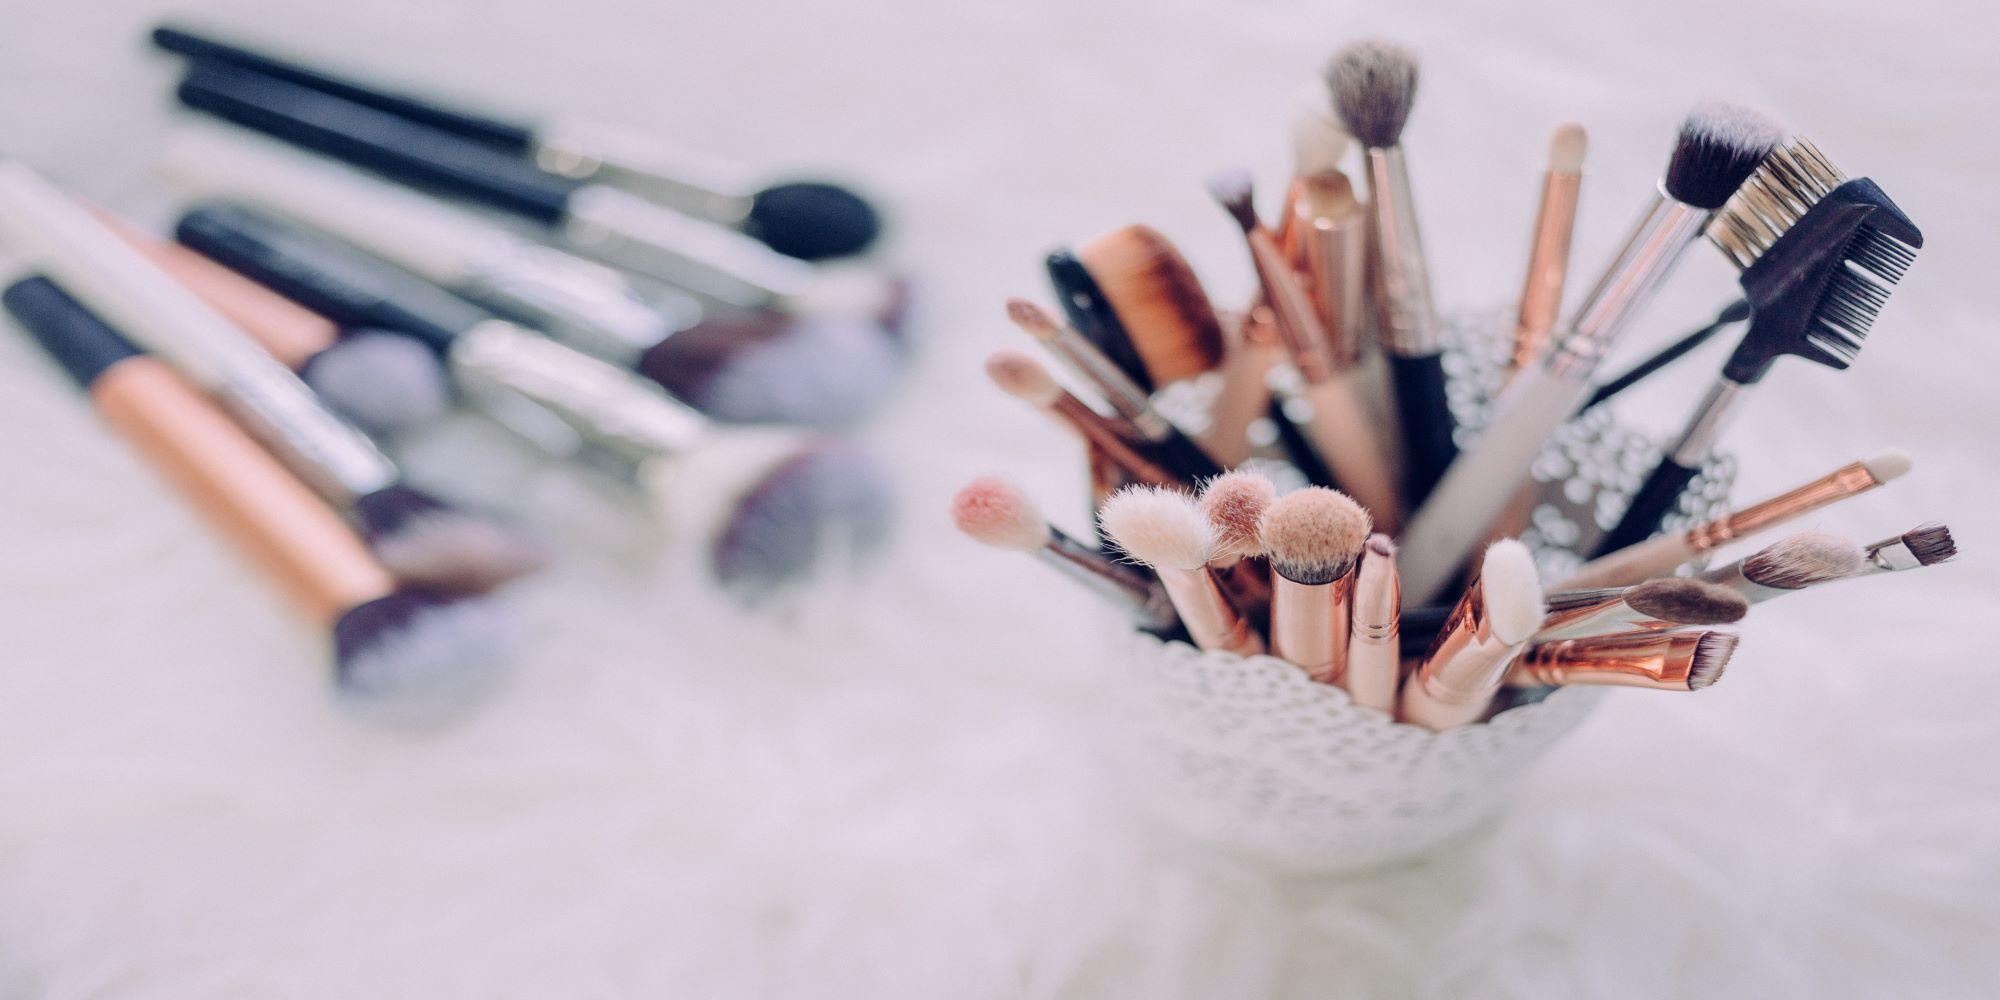 International Marketing News: Amazon To Host Beauty Product Event